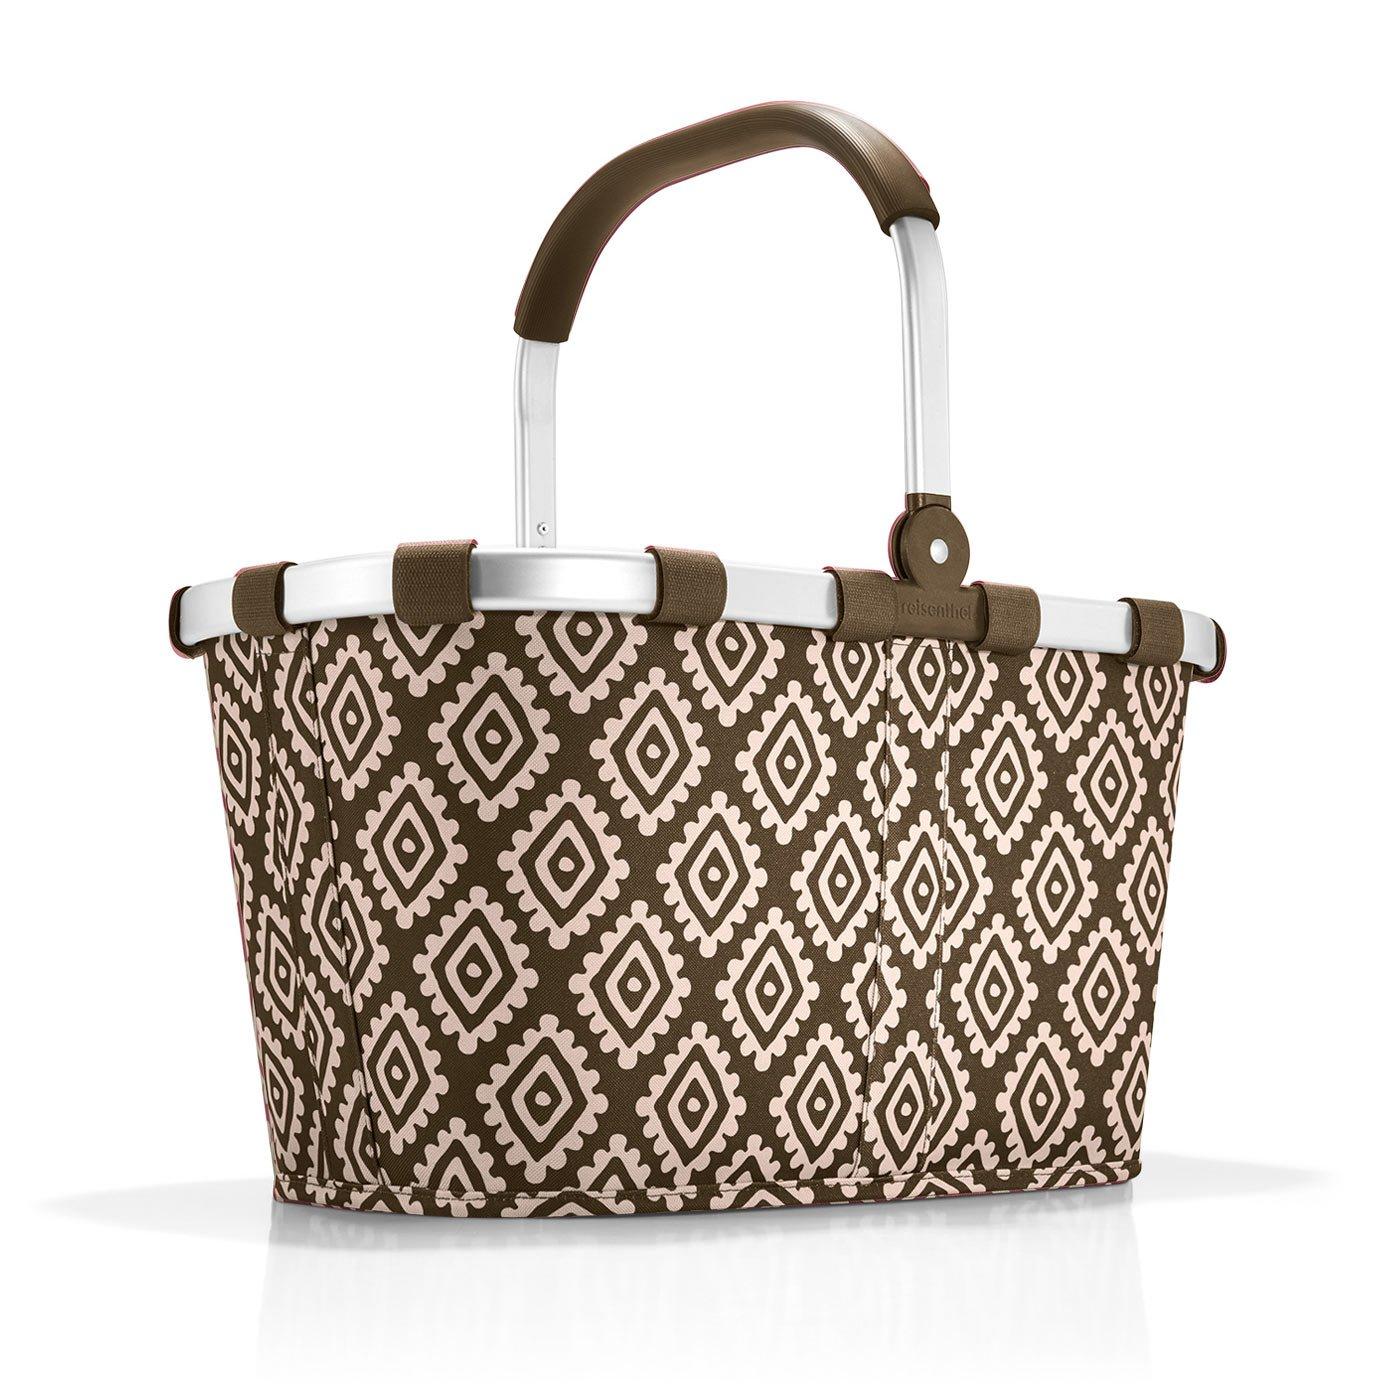 Reisenthel carrybag Cabas de Fitness, 48 cm, 22 liters, Marron (Diamonds Mocha) BK6039